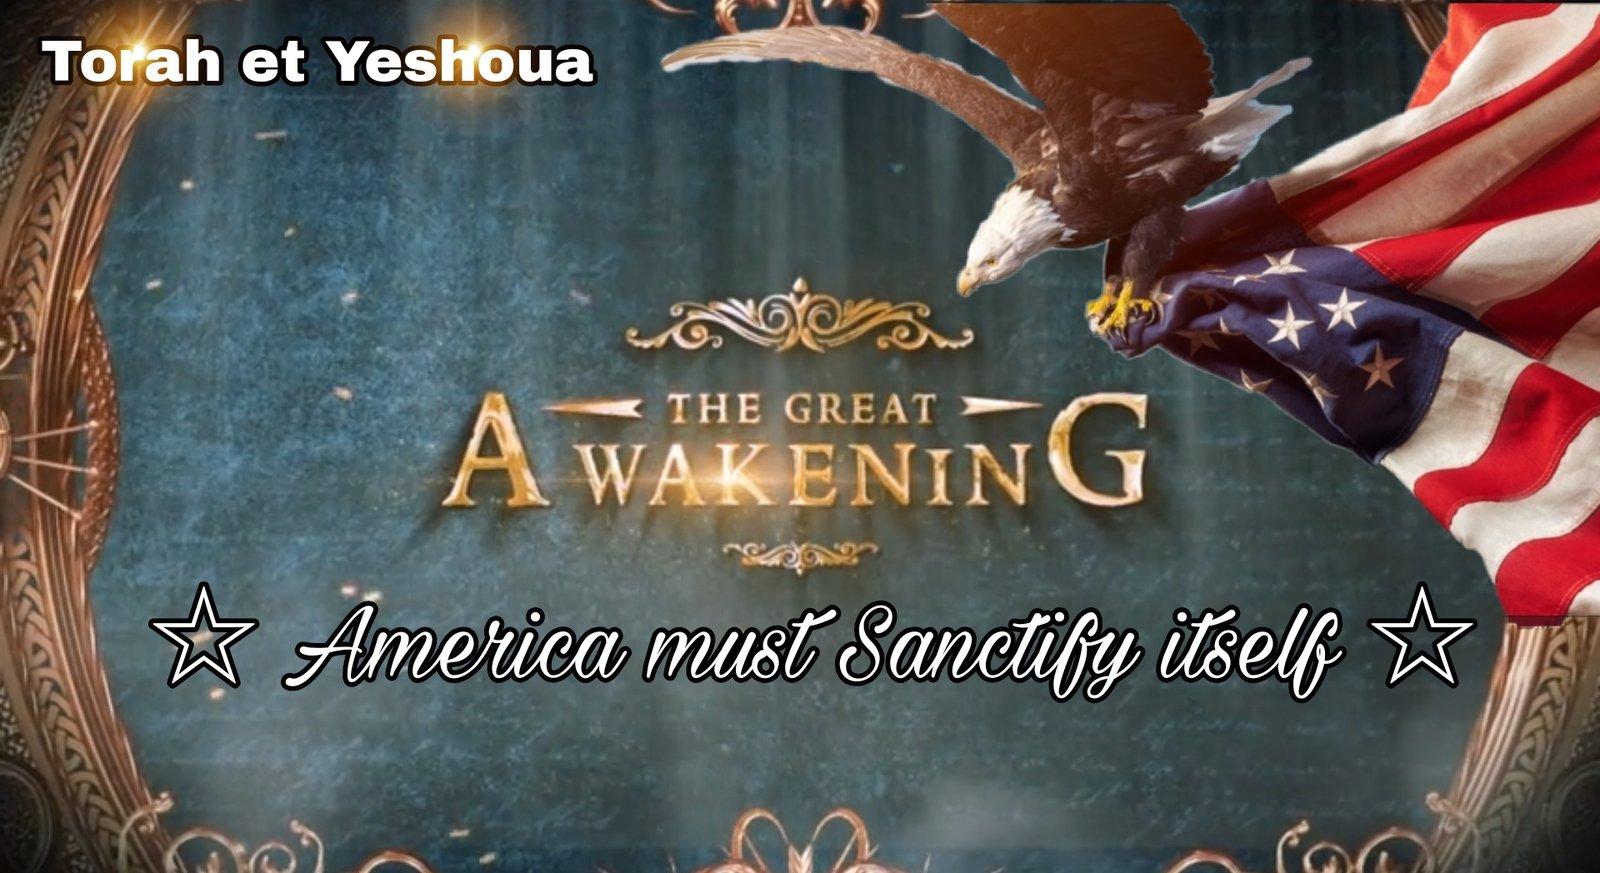 America's must Sanctify itself ☆ the Great Awakening ☆ 210524091633301455